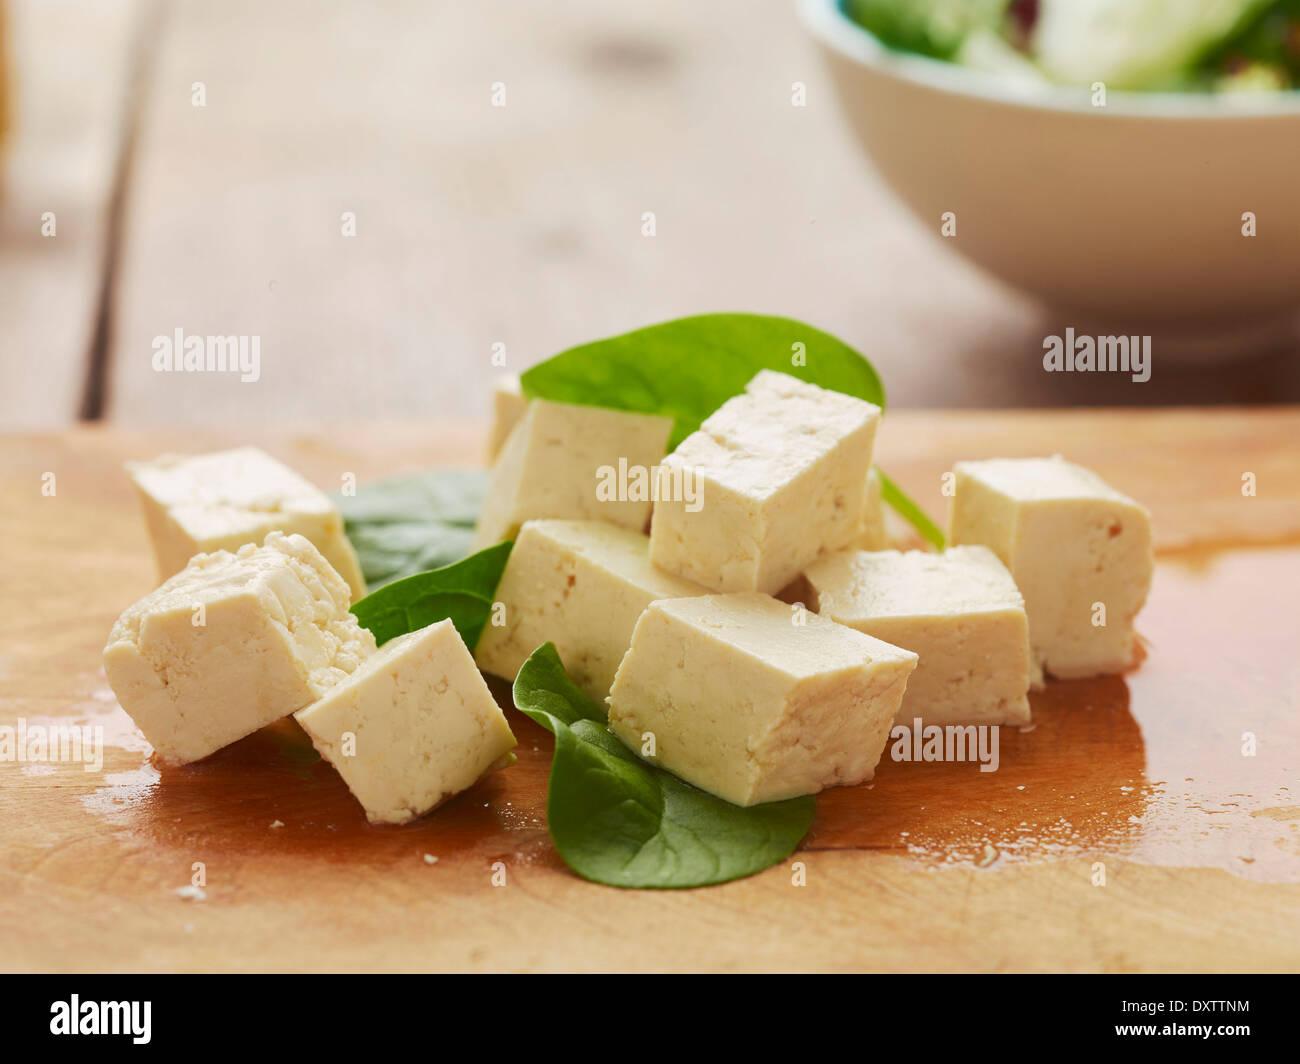 Tofu - Stock Image